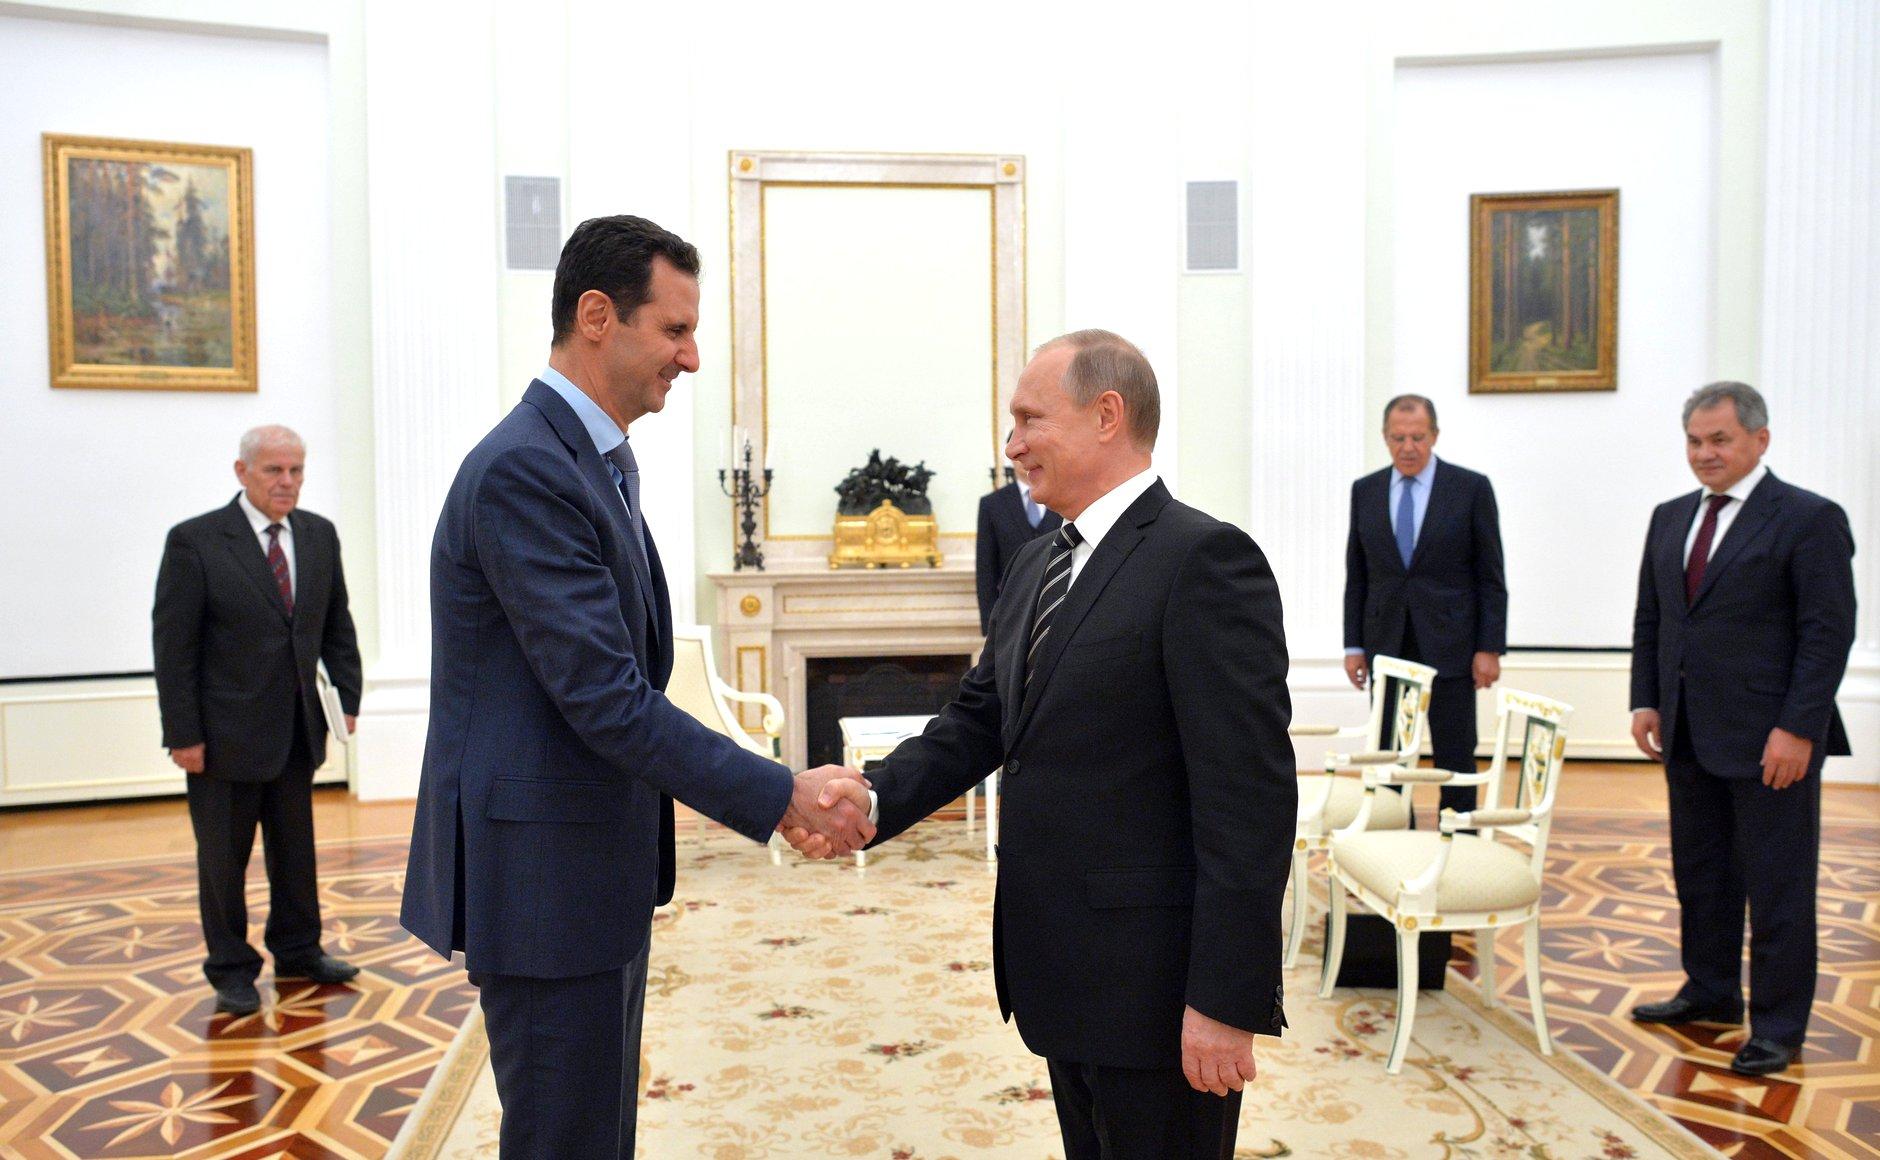 https://upload.wikimedia.org/wikipedia/commons/1/1f/Bashar_al-Assad_in_Russia_(2015-10-21)_06.jpg